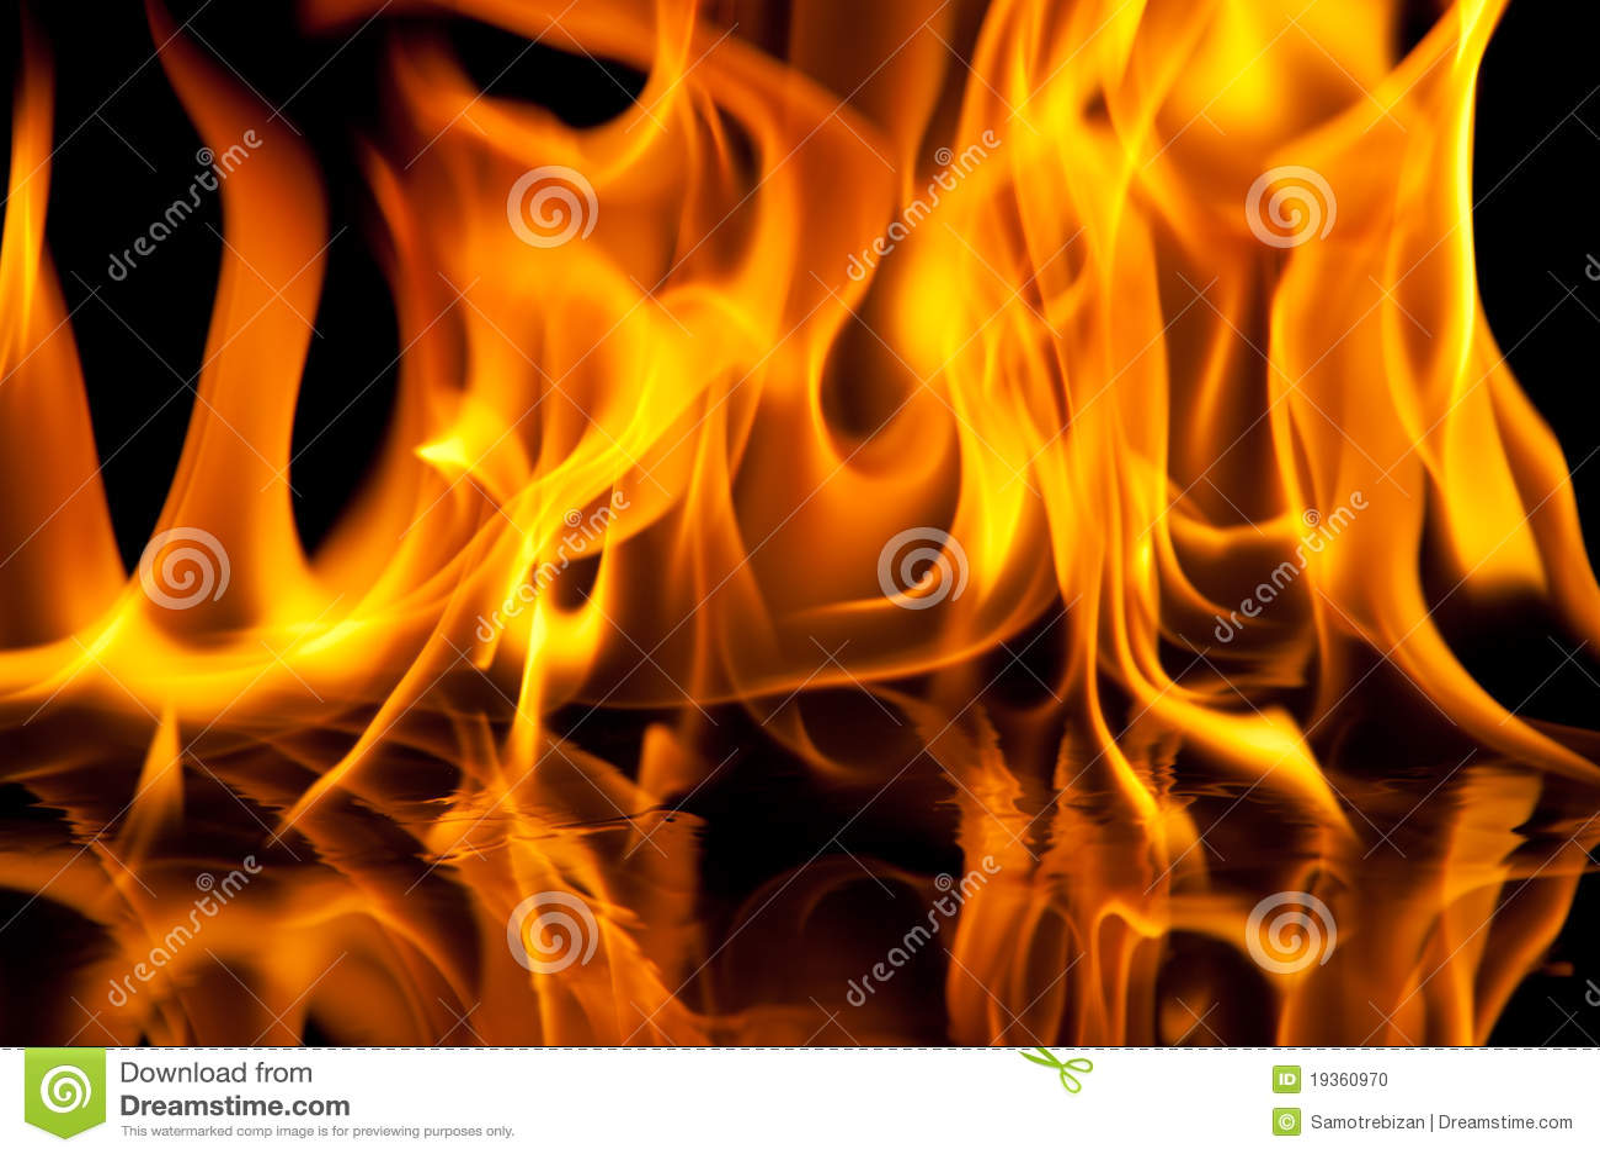 Textura da flama no fundo preto